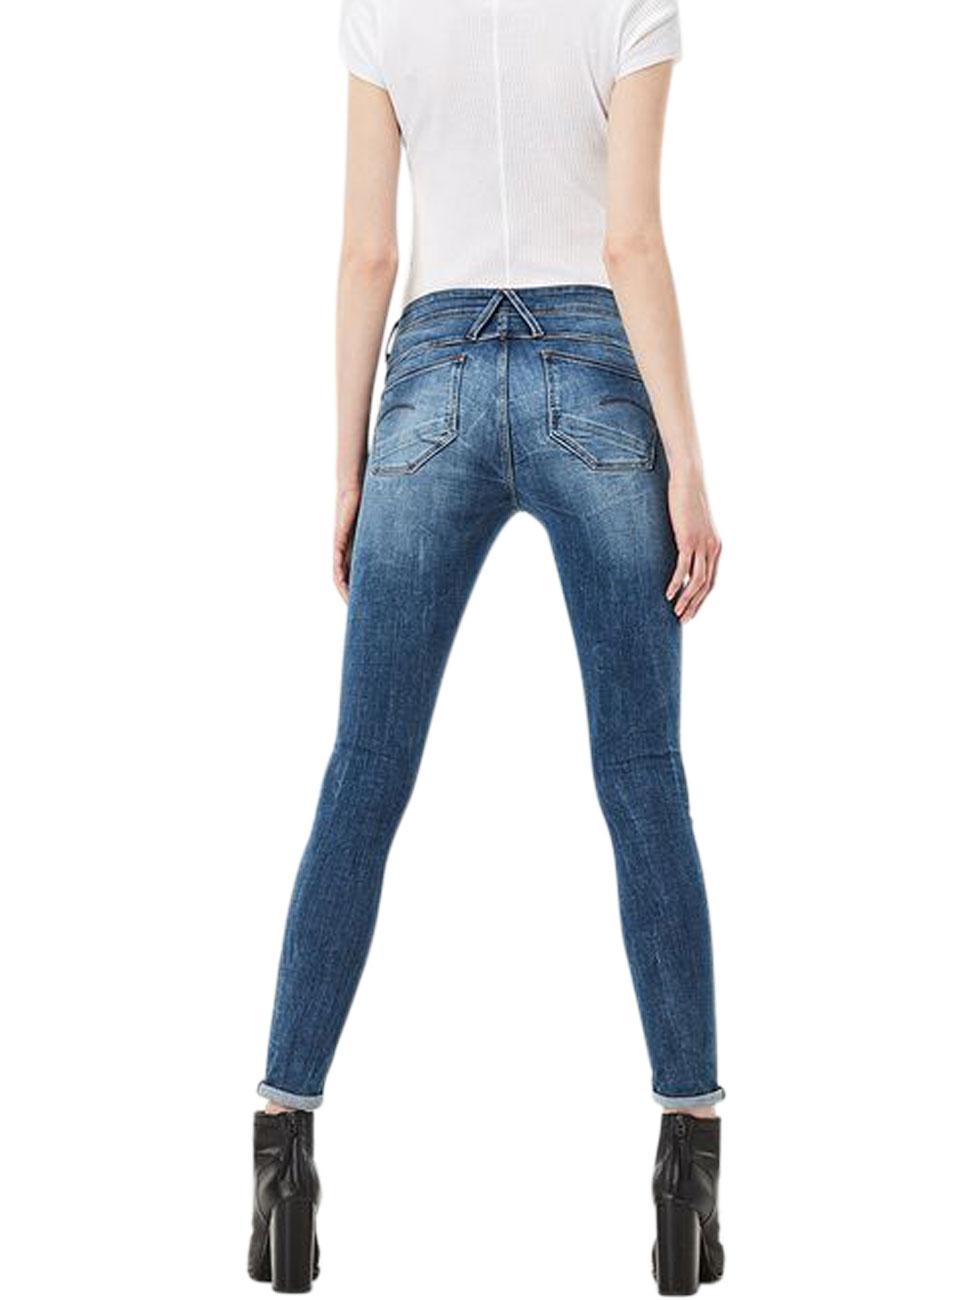 g-star-damen-jeans-lynn-mid-waist-super-skinny-blau-medium-aged